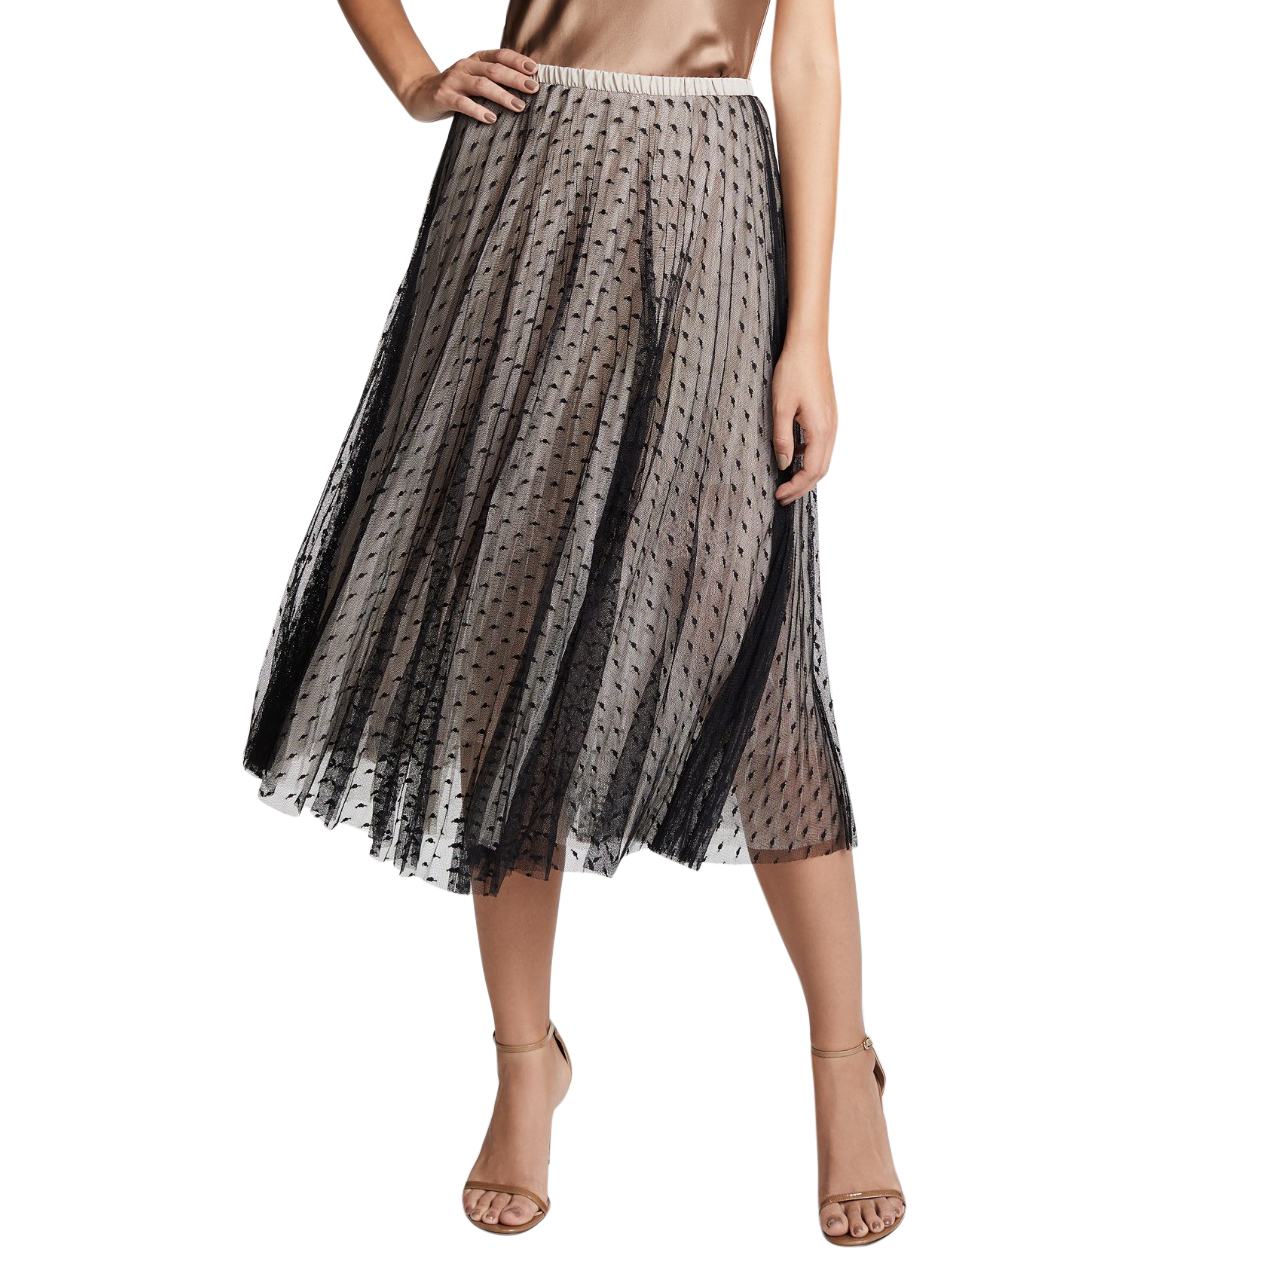 Loyd/Ford Multi Layer Tulle Skirt